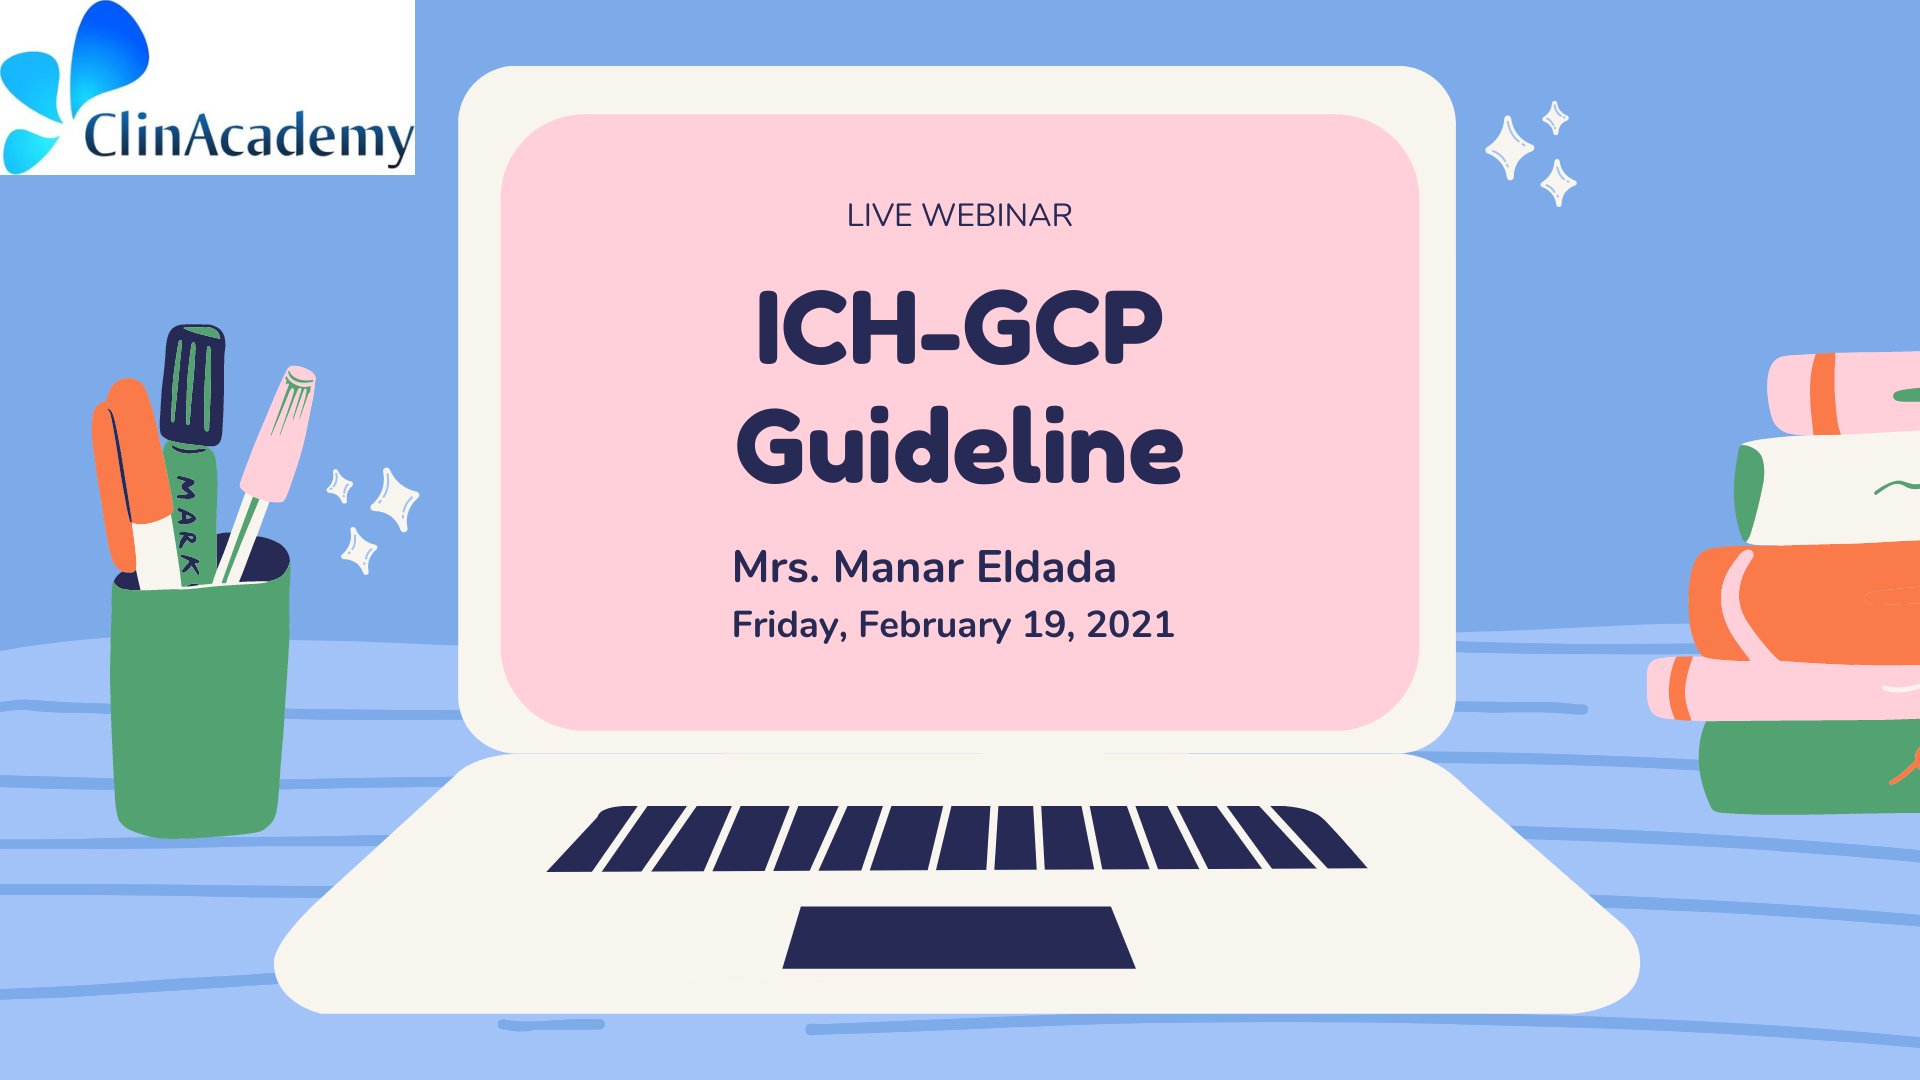 ICH-GCP Guideline